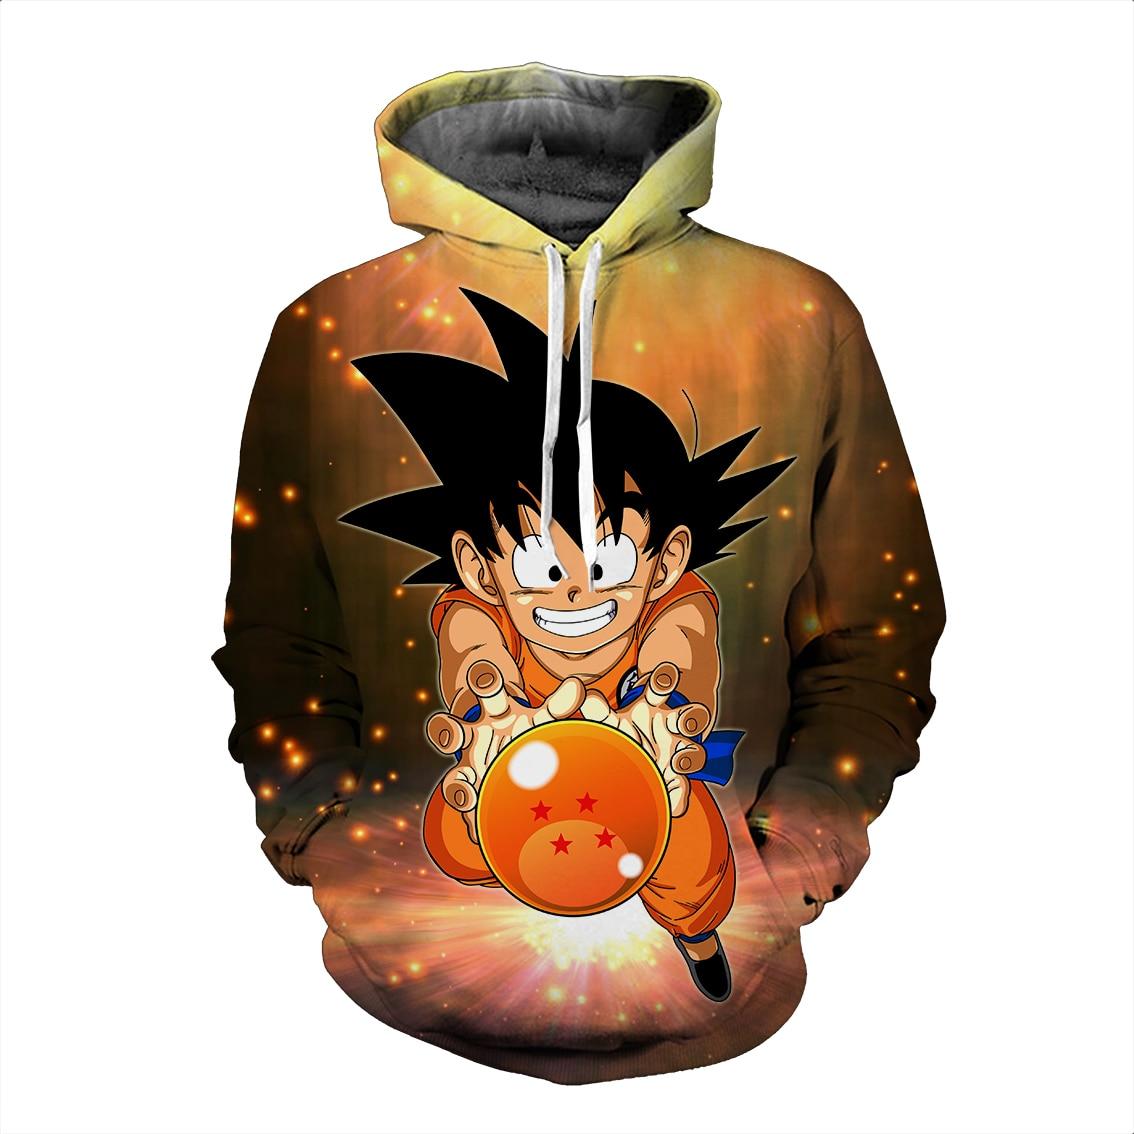 Dragon Ball Z 3d Hoodies Pullover Kaus Anime Lucu Kartun Kaus 2018